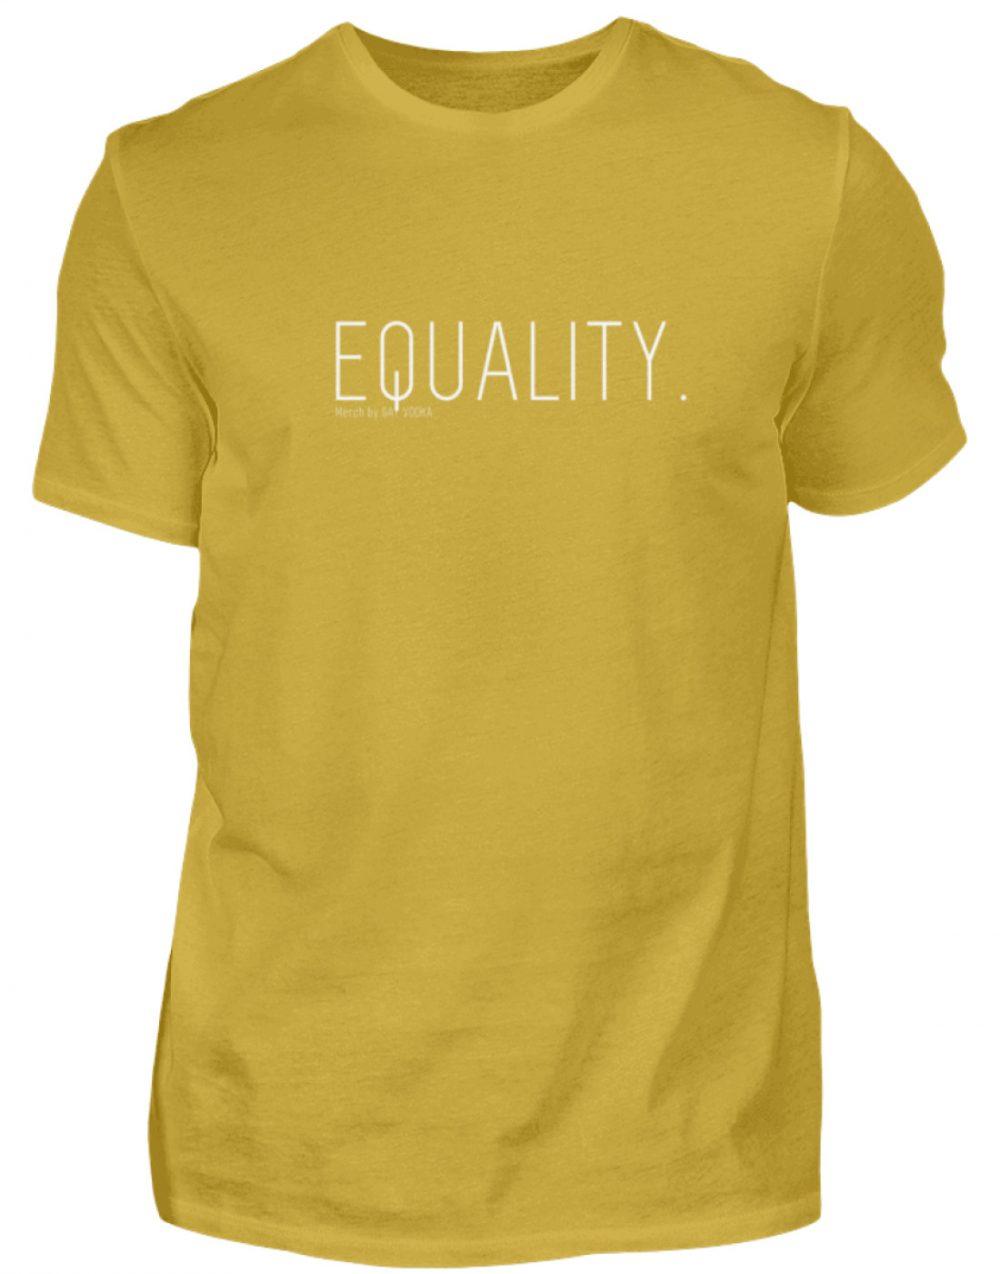 EQUALITY. - Herren Premiumshirt-2980